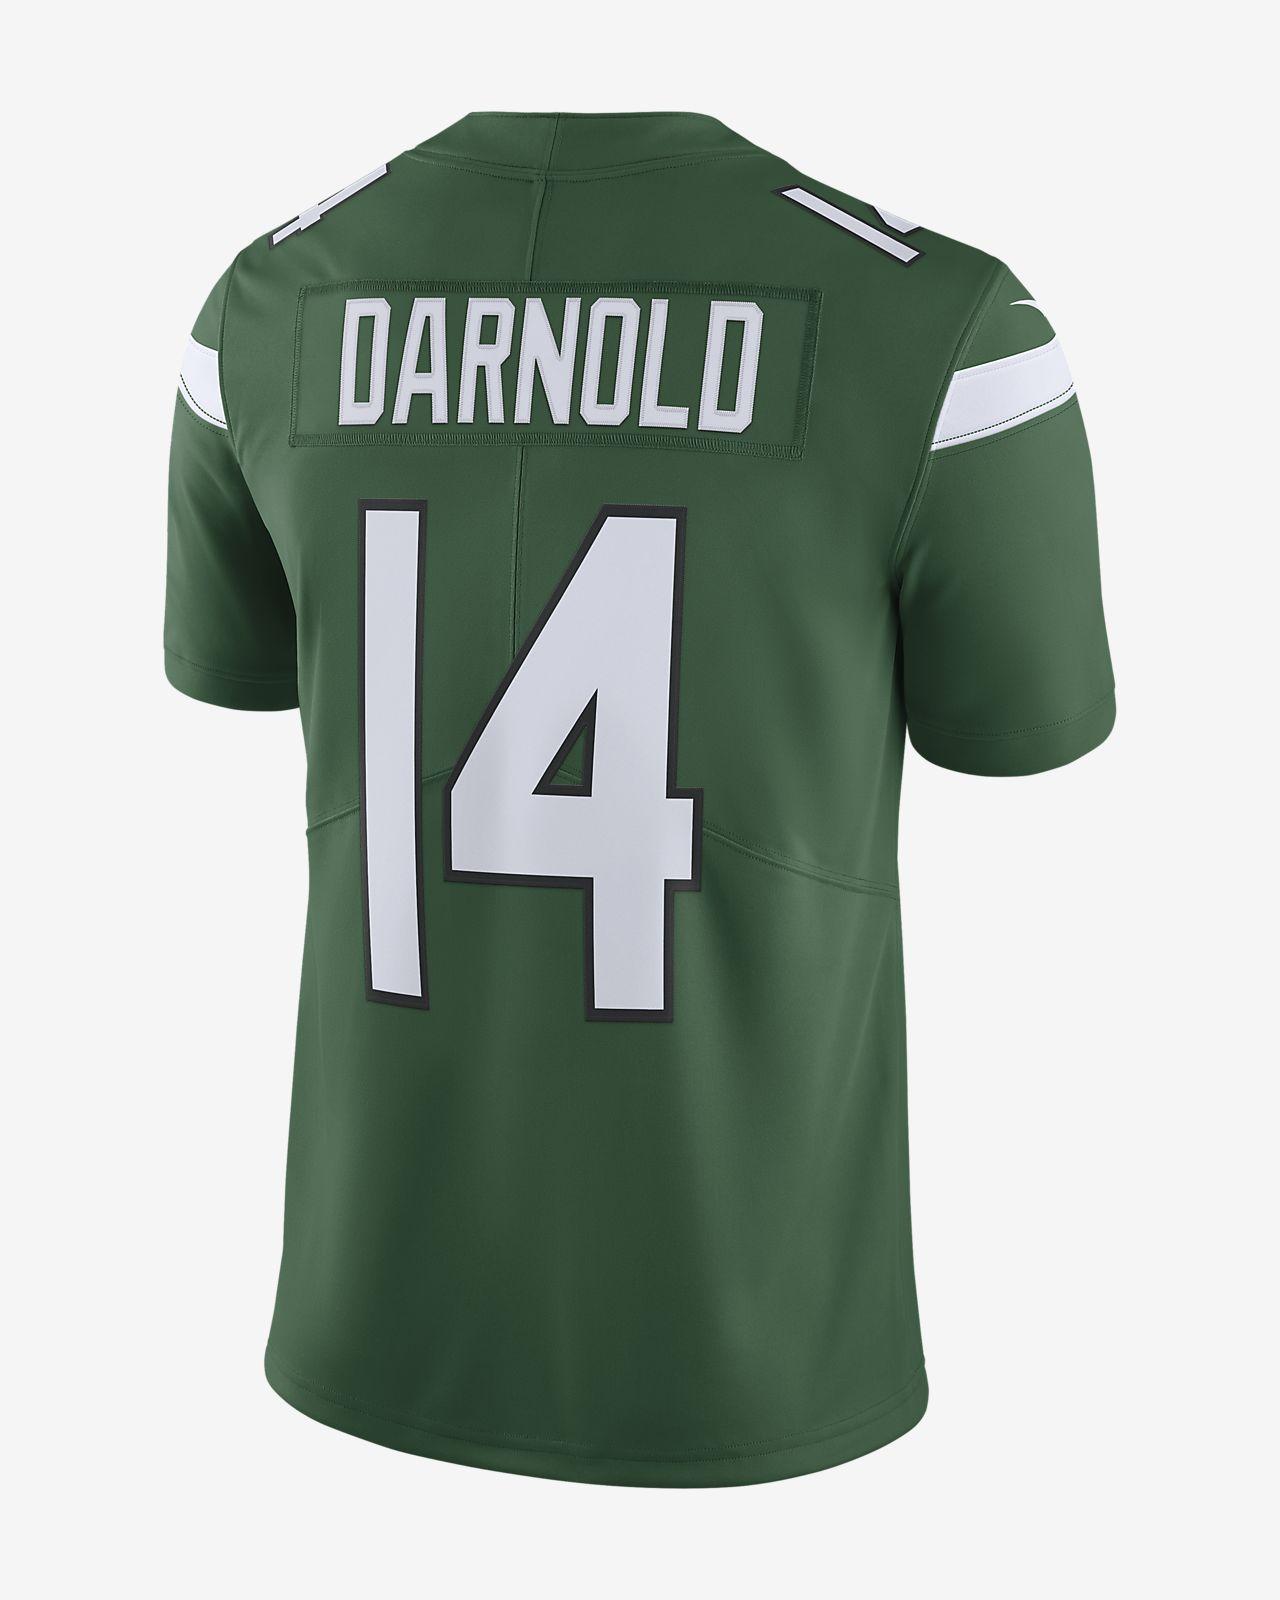 cc99326f38 NFL New York Jets (Sam Darnold) Men's Limited Football Jersey